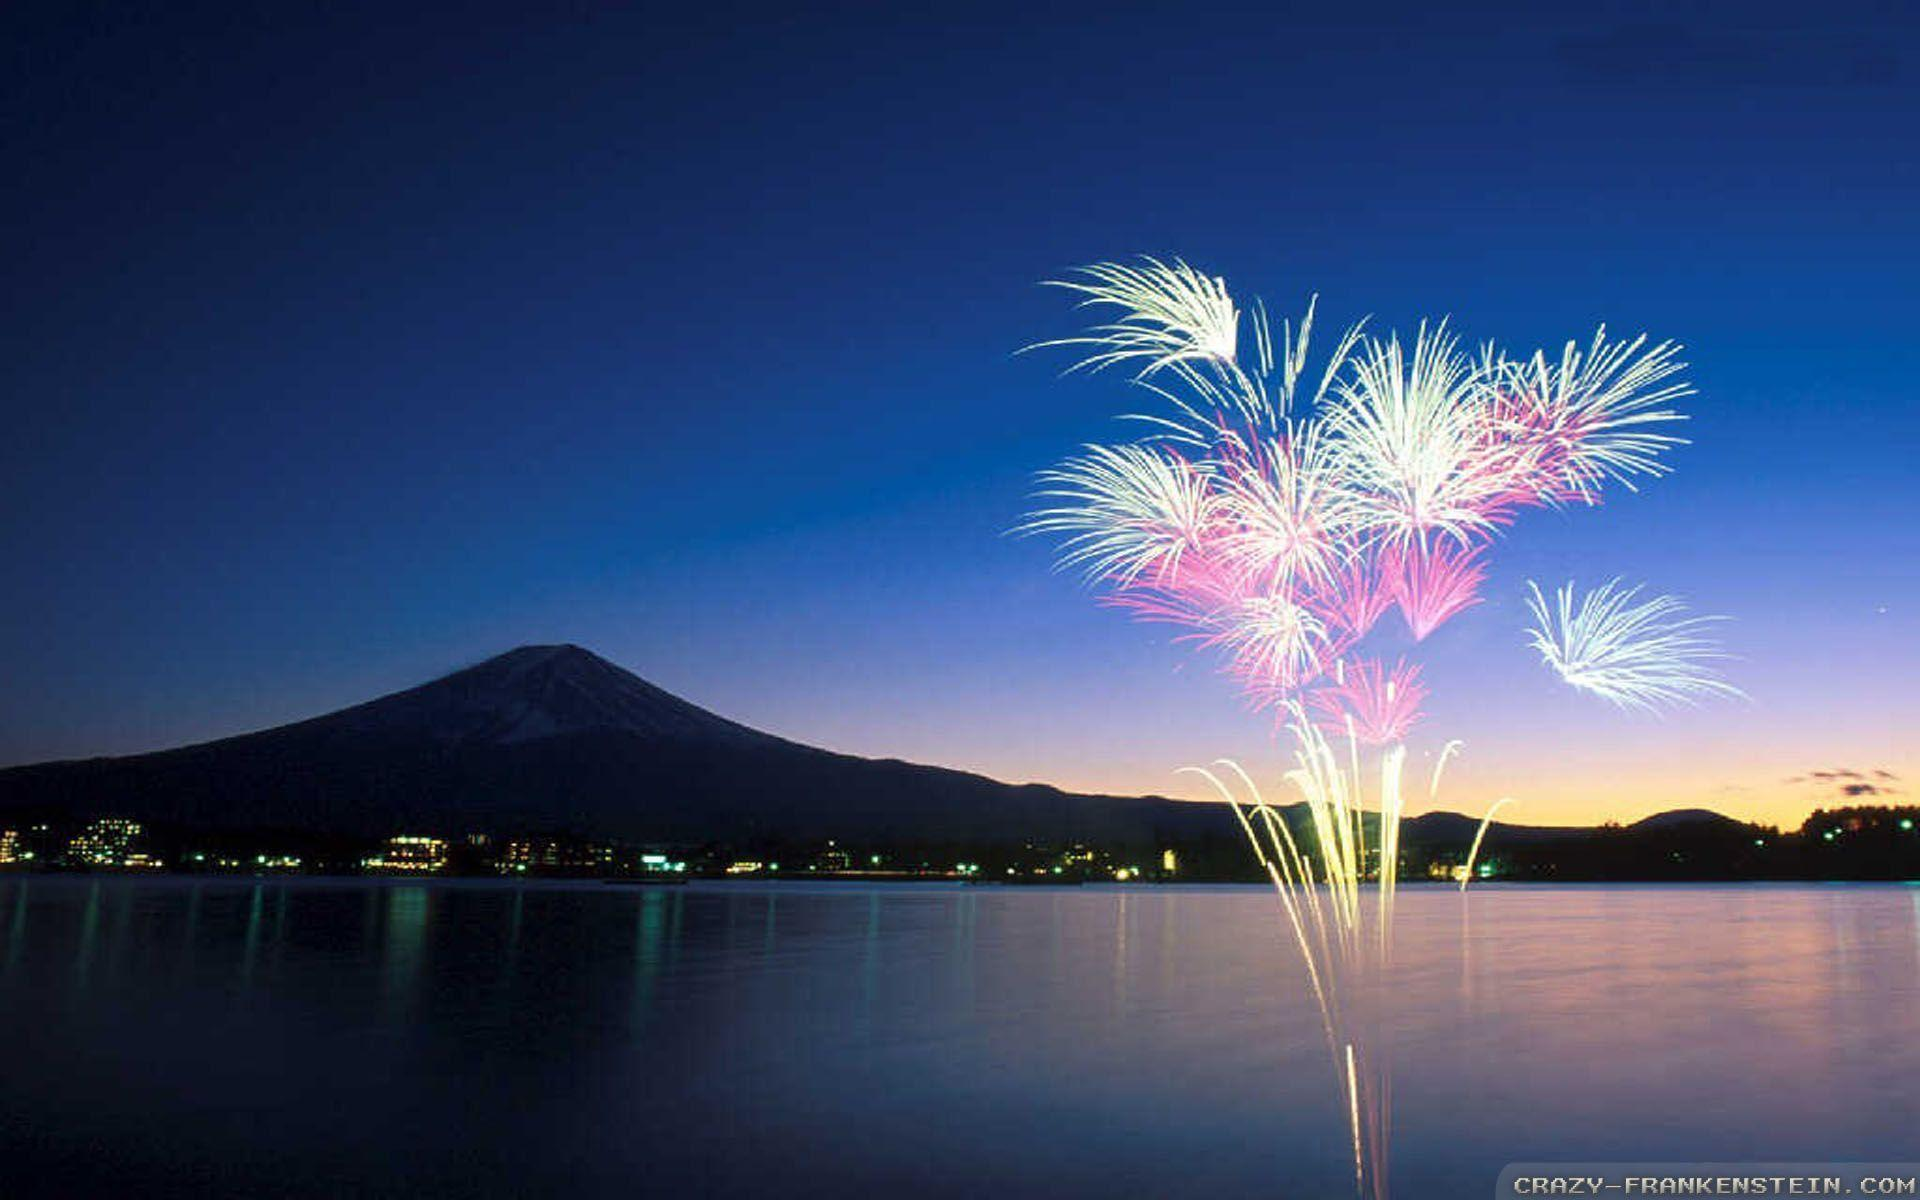 Fireworks Wallpaper Free: Fireworks Wallpapers